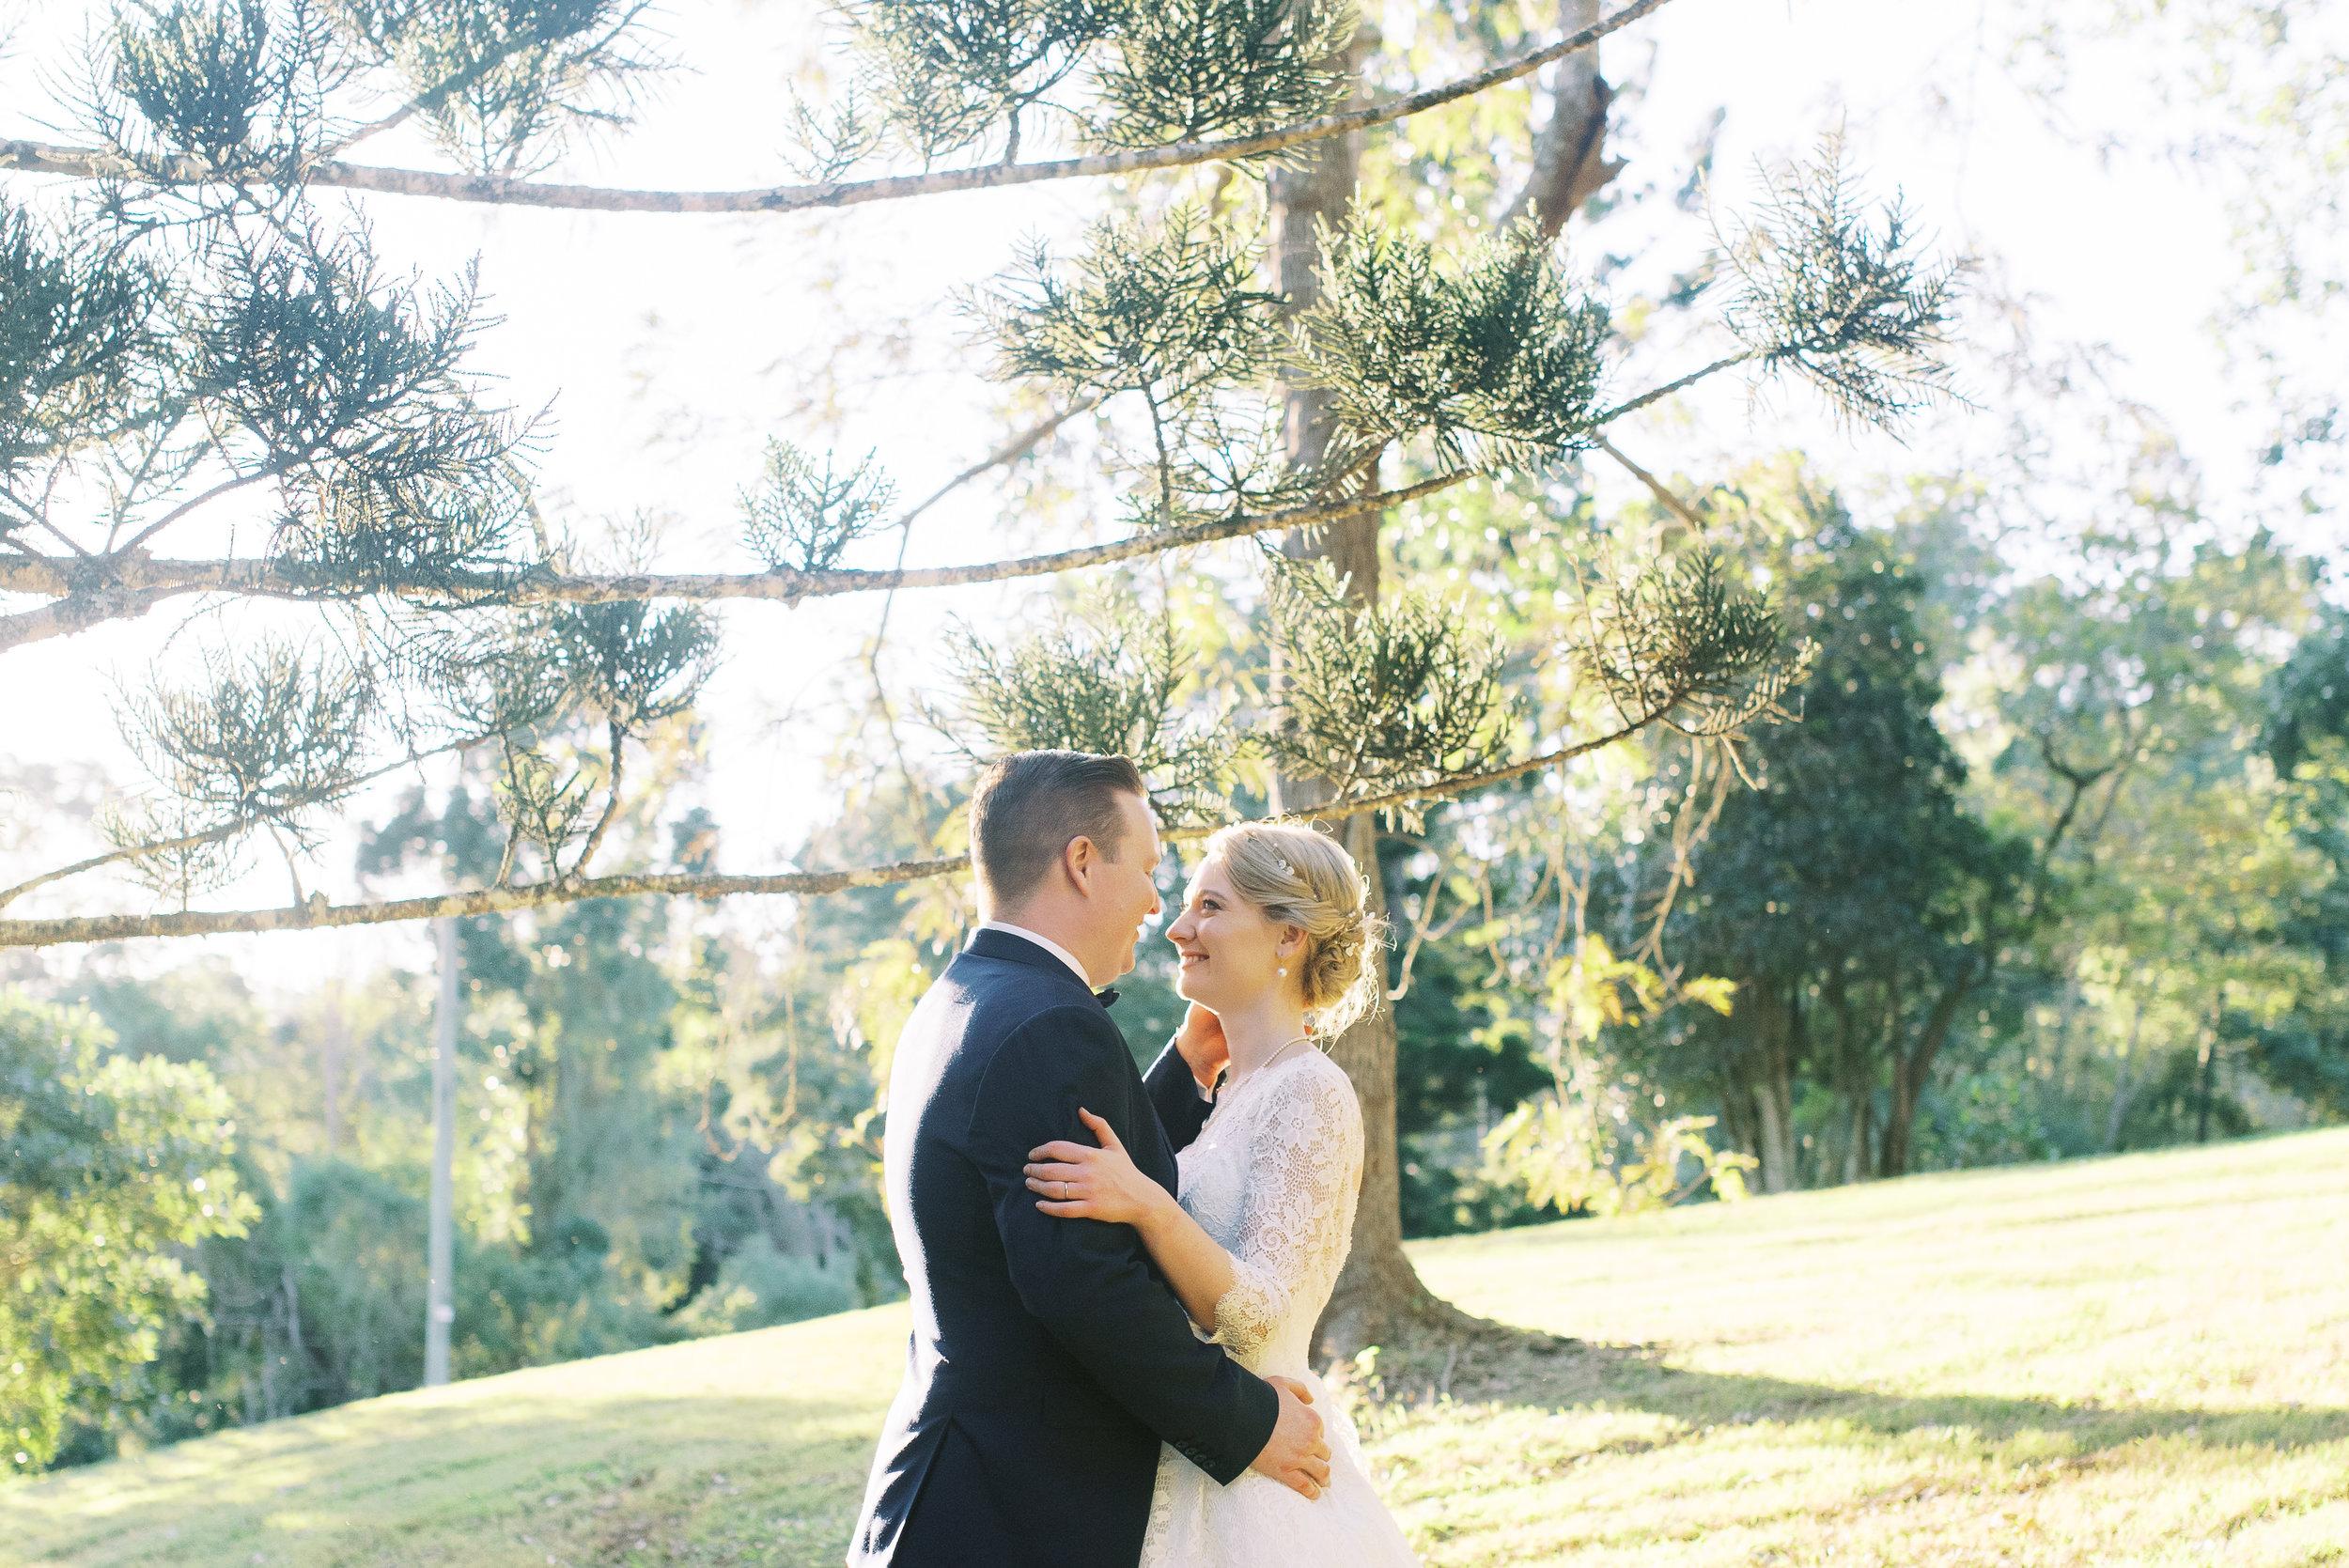 romantic-australian-fine-art-wedding-photographer-12.jpg